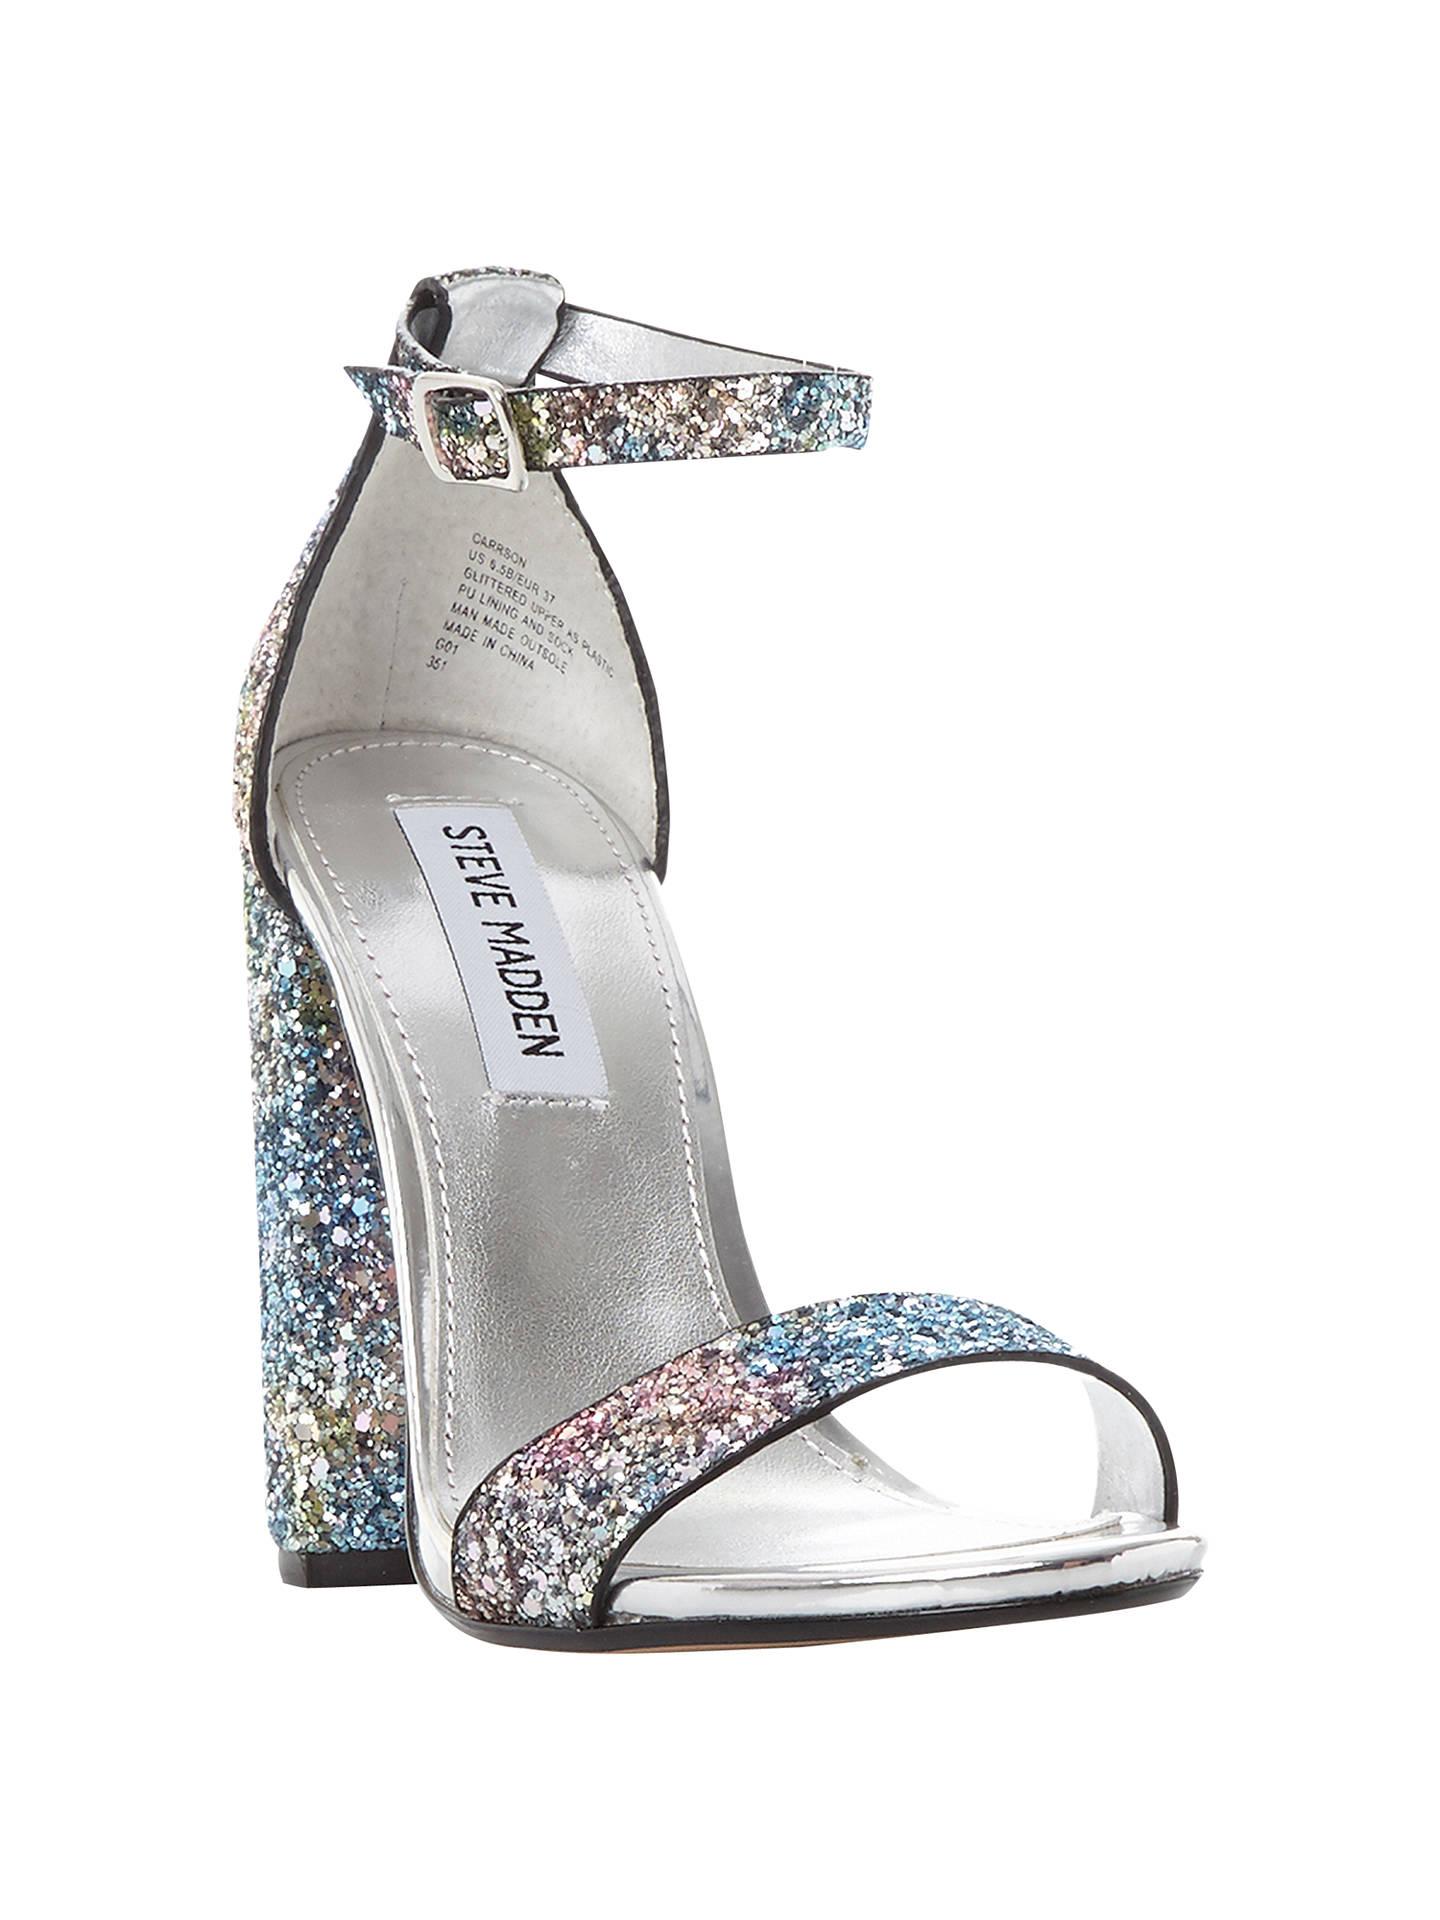 3304874f1698 Buy Steve Madden Carrson High Block Heel Two Part Sandals, Glitter Multi, 3  Online ...